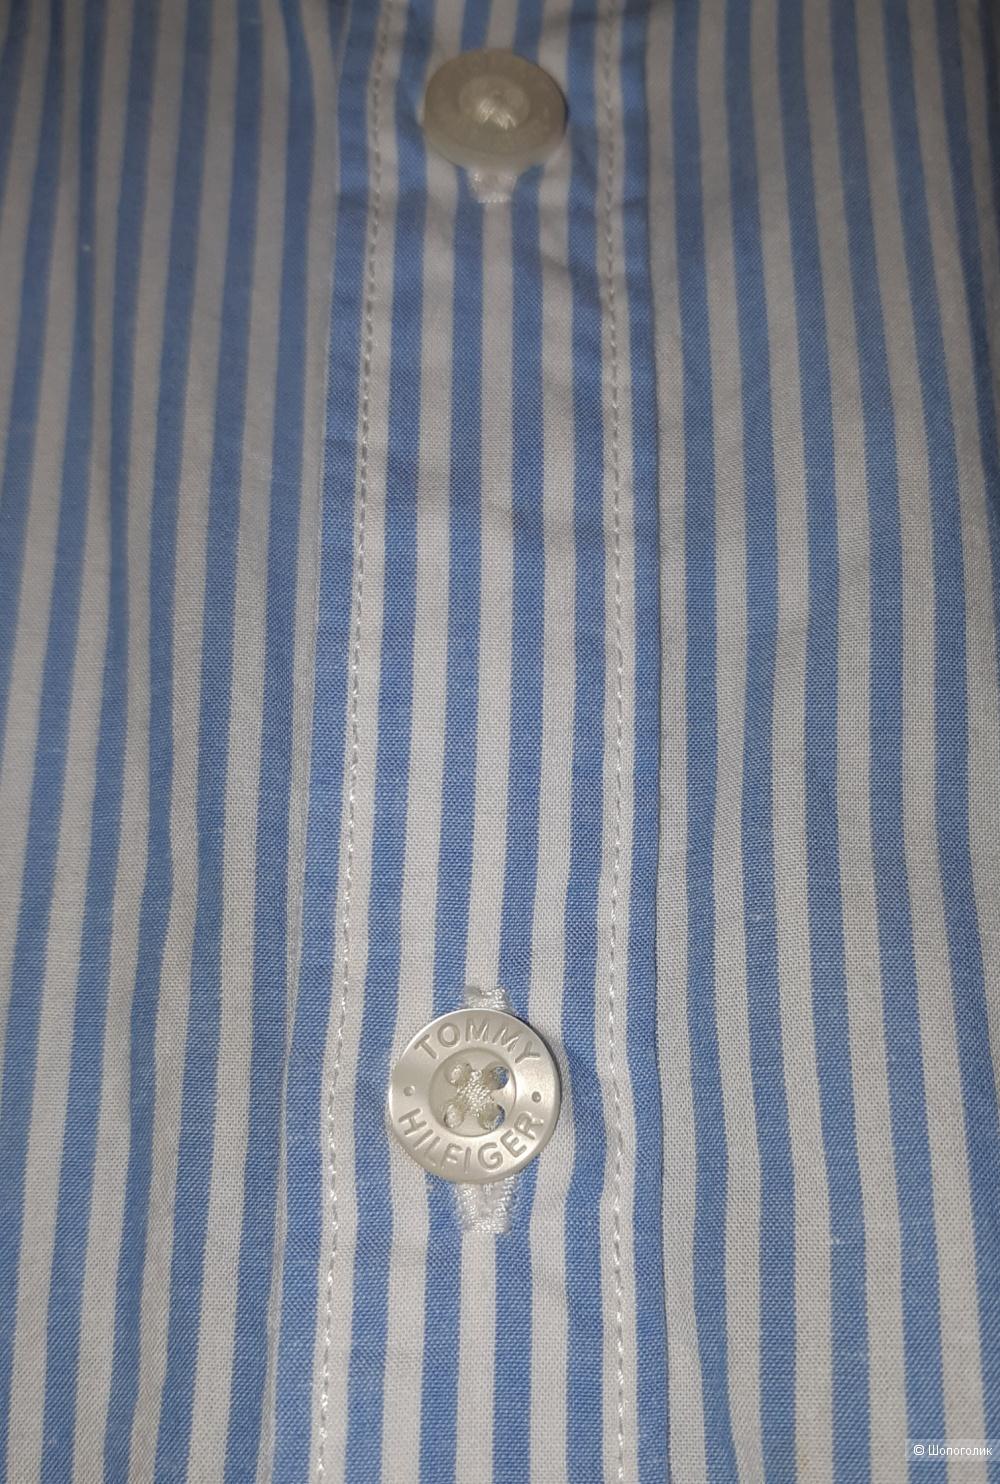 Рубашка для мальчика tommy hilfiger, размер 11/12